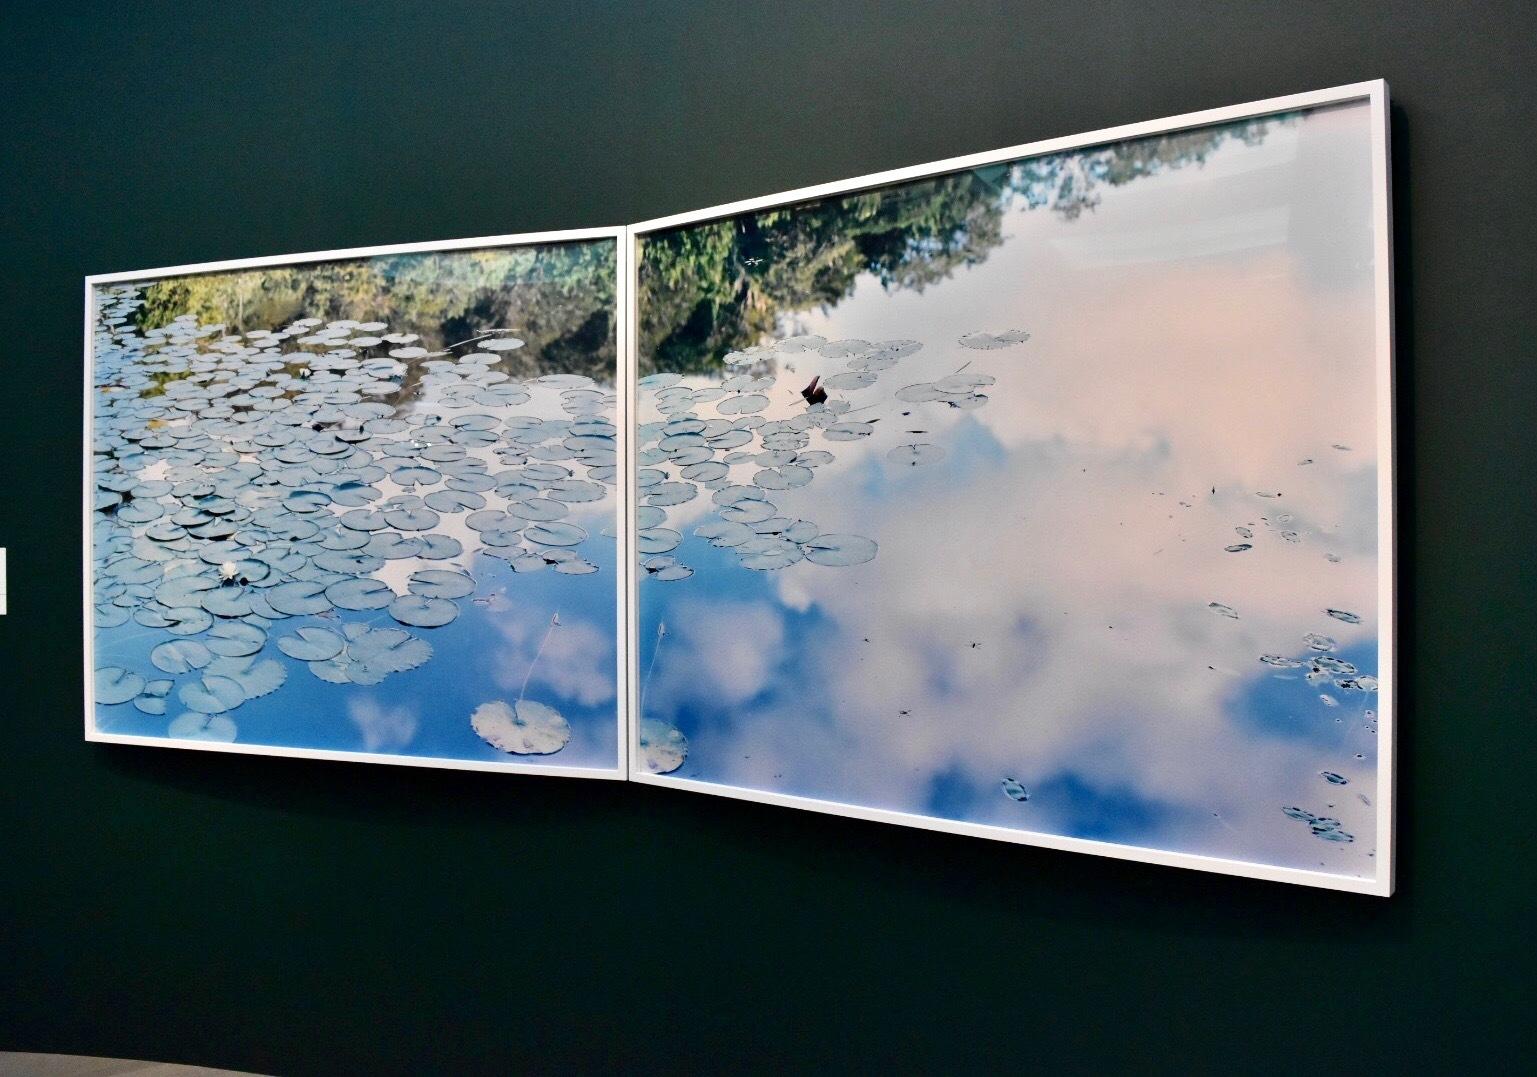 鈴木理策 《水鏡 14, WM-77》(左)《水鏡 14, WM-79》(右) 2014年 作家蔵 (C)Risaku Suzuki, Courtesy of Taka Ishi Gallery